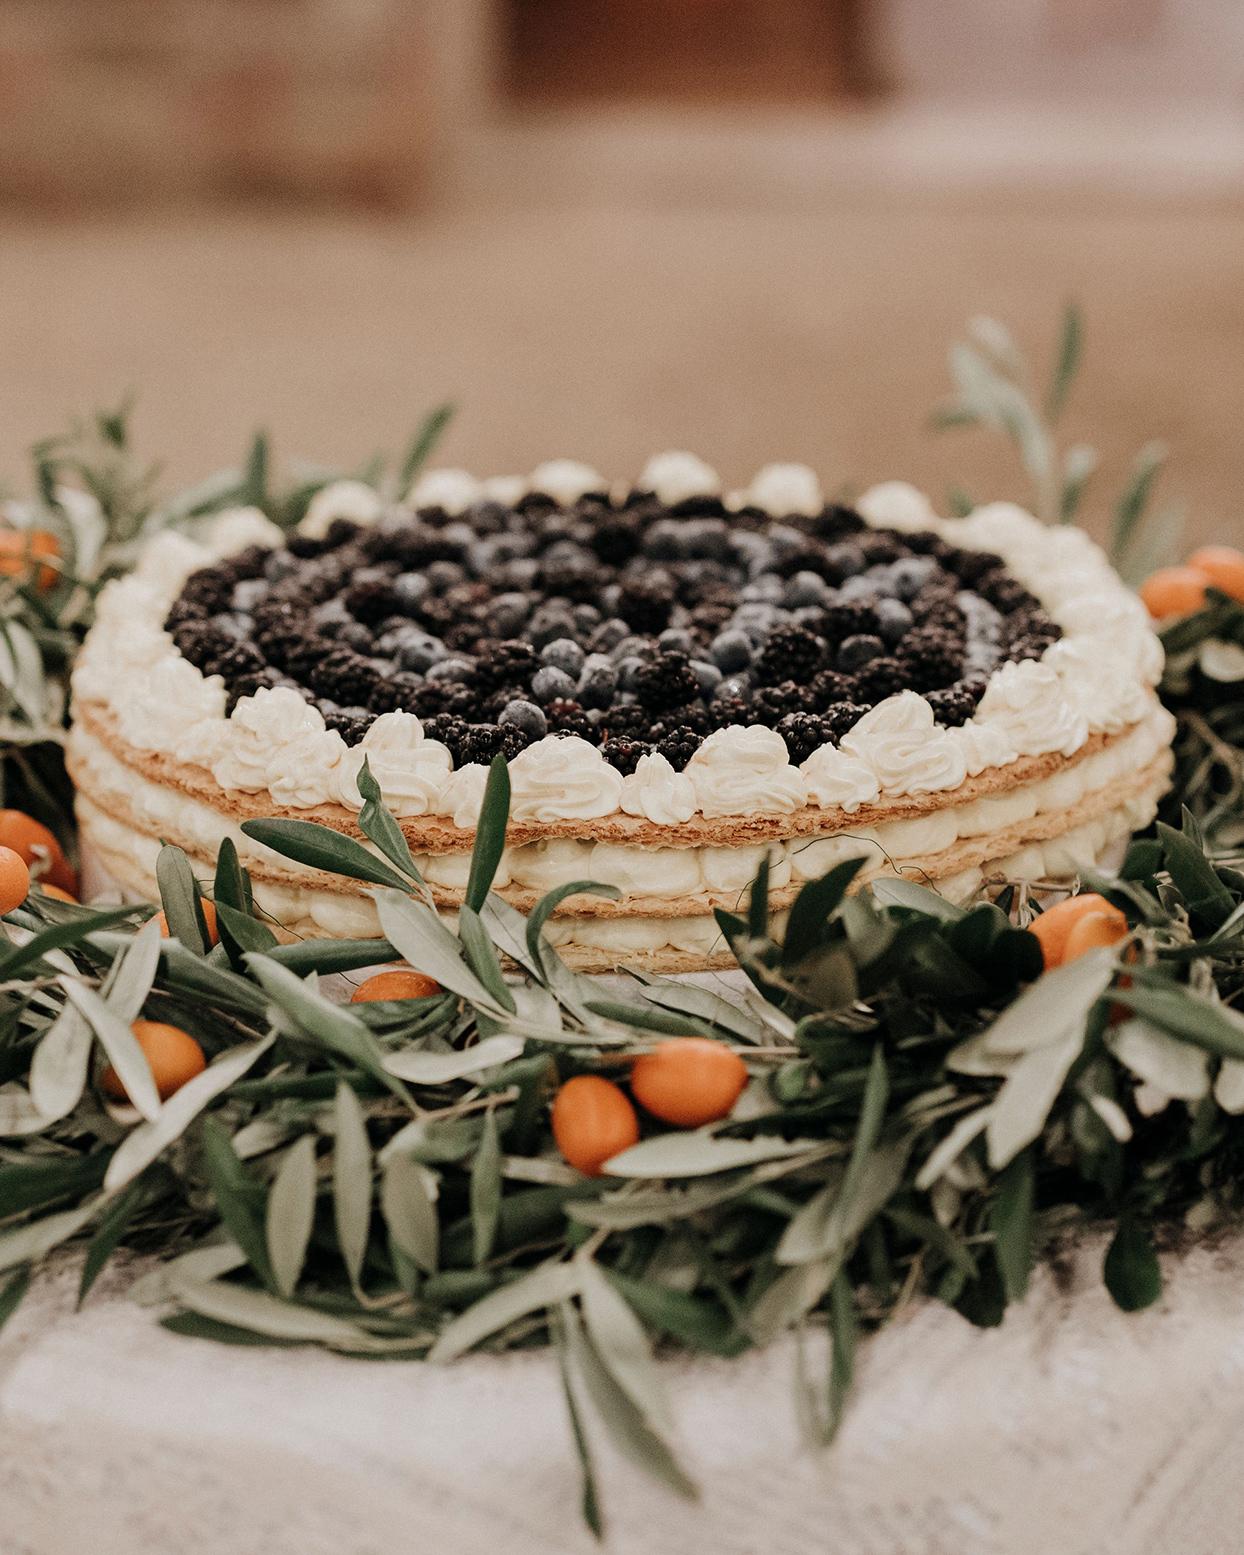 jaclyn antonio wedding layer cake with berries